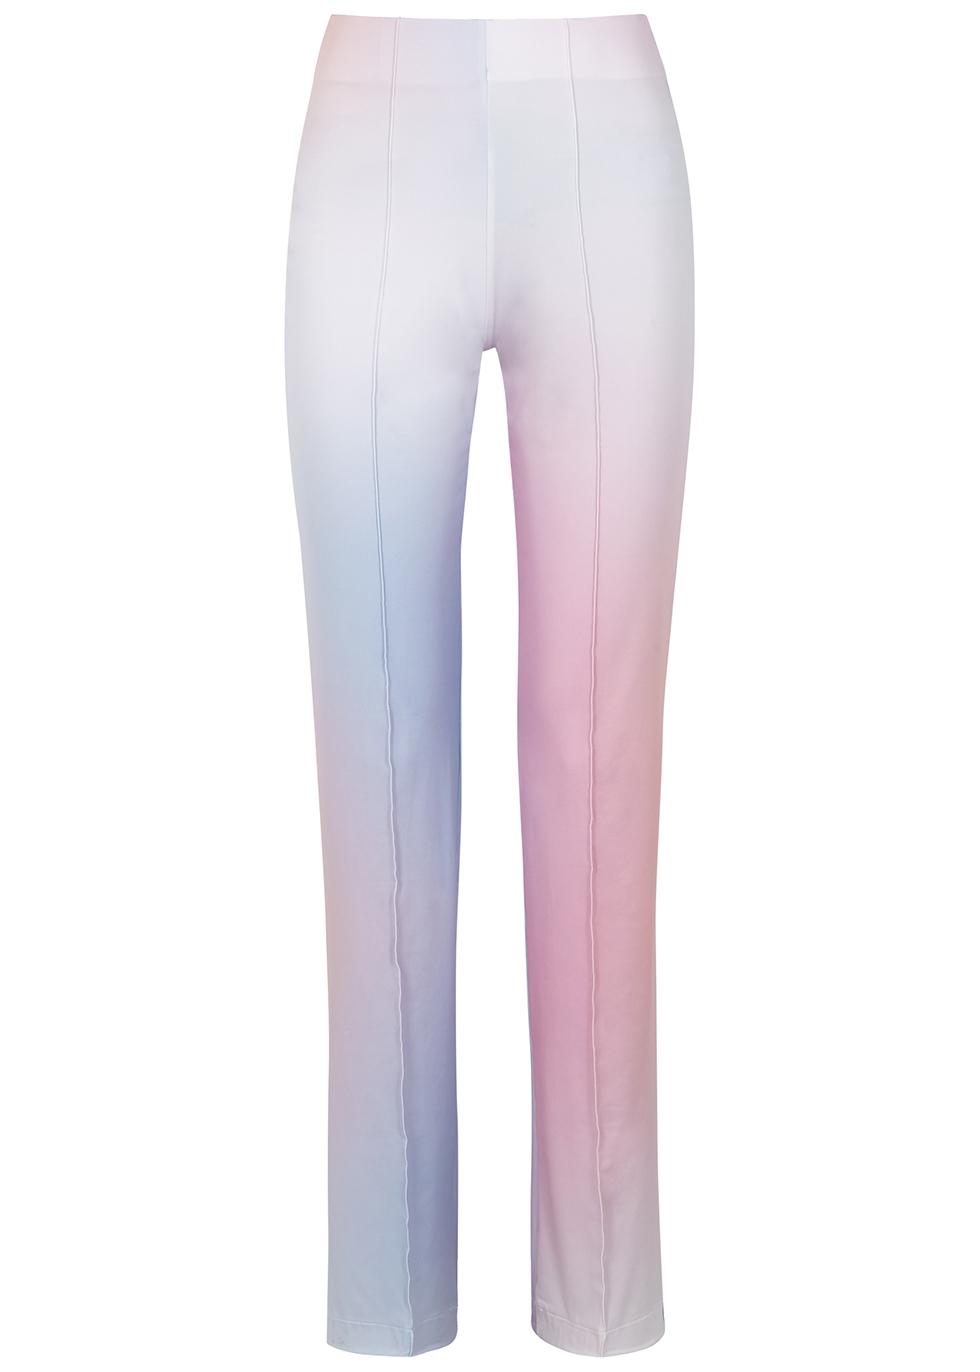 Kylie Jenner rocking Purple straight fit pants